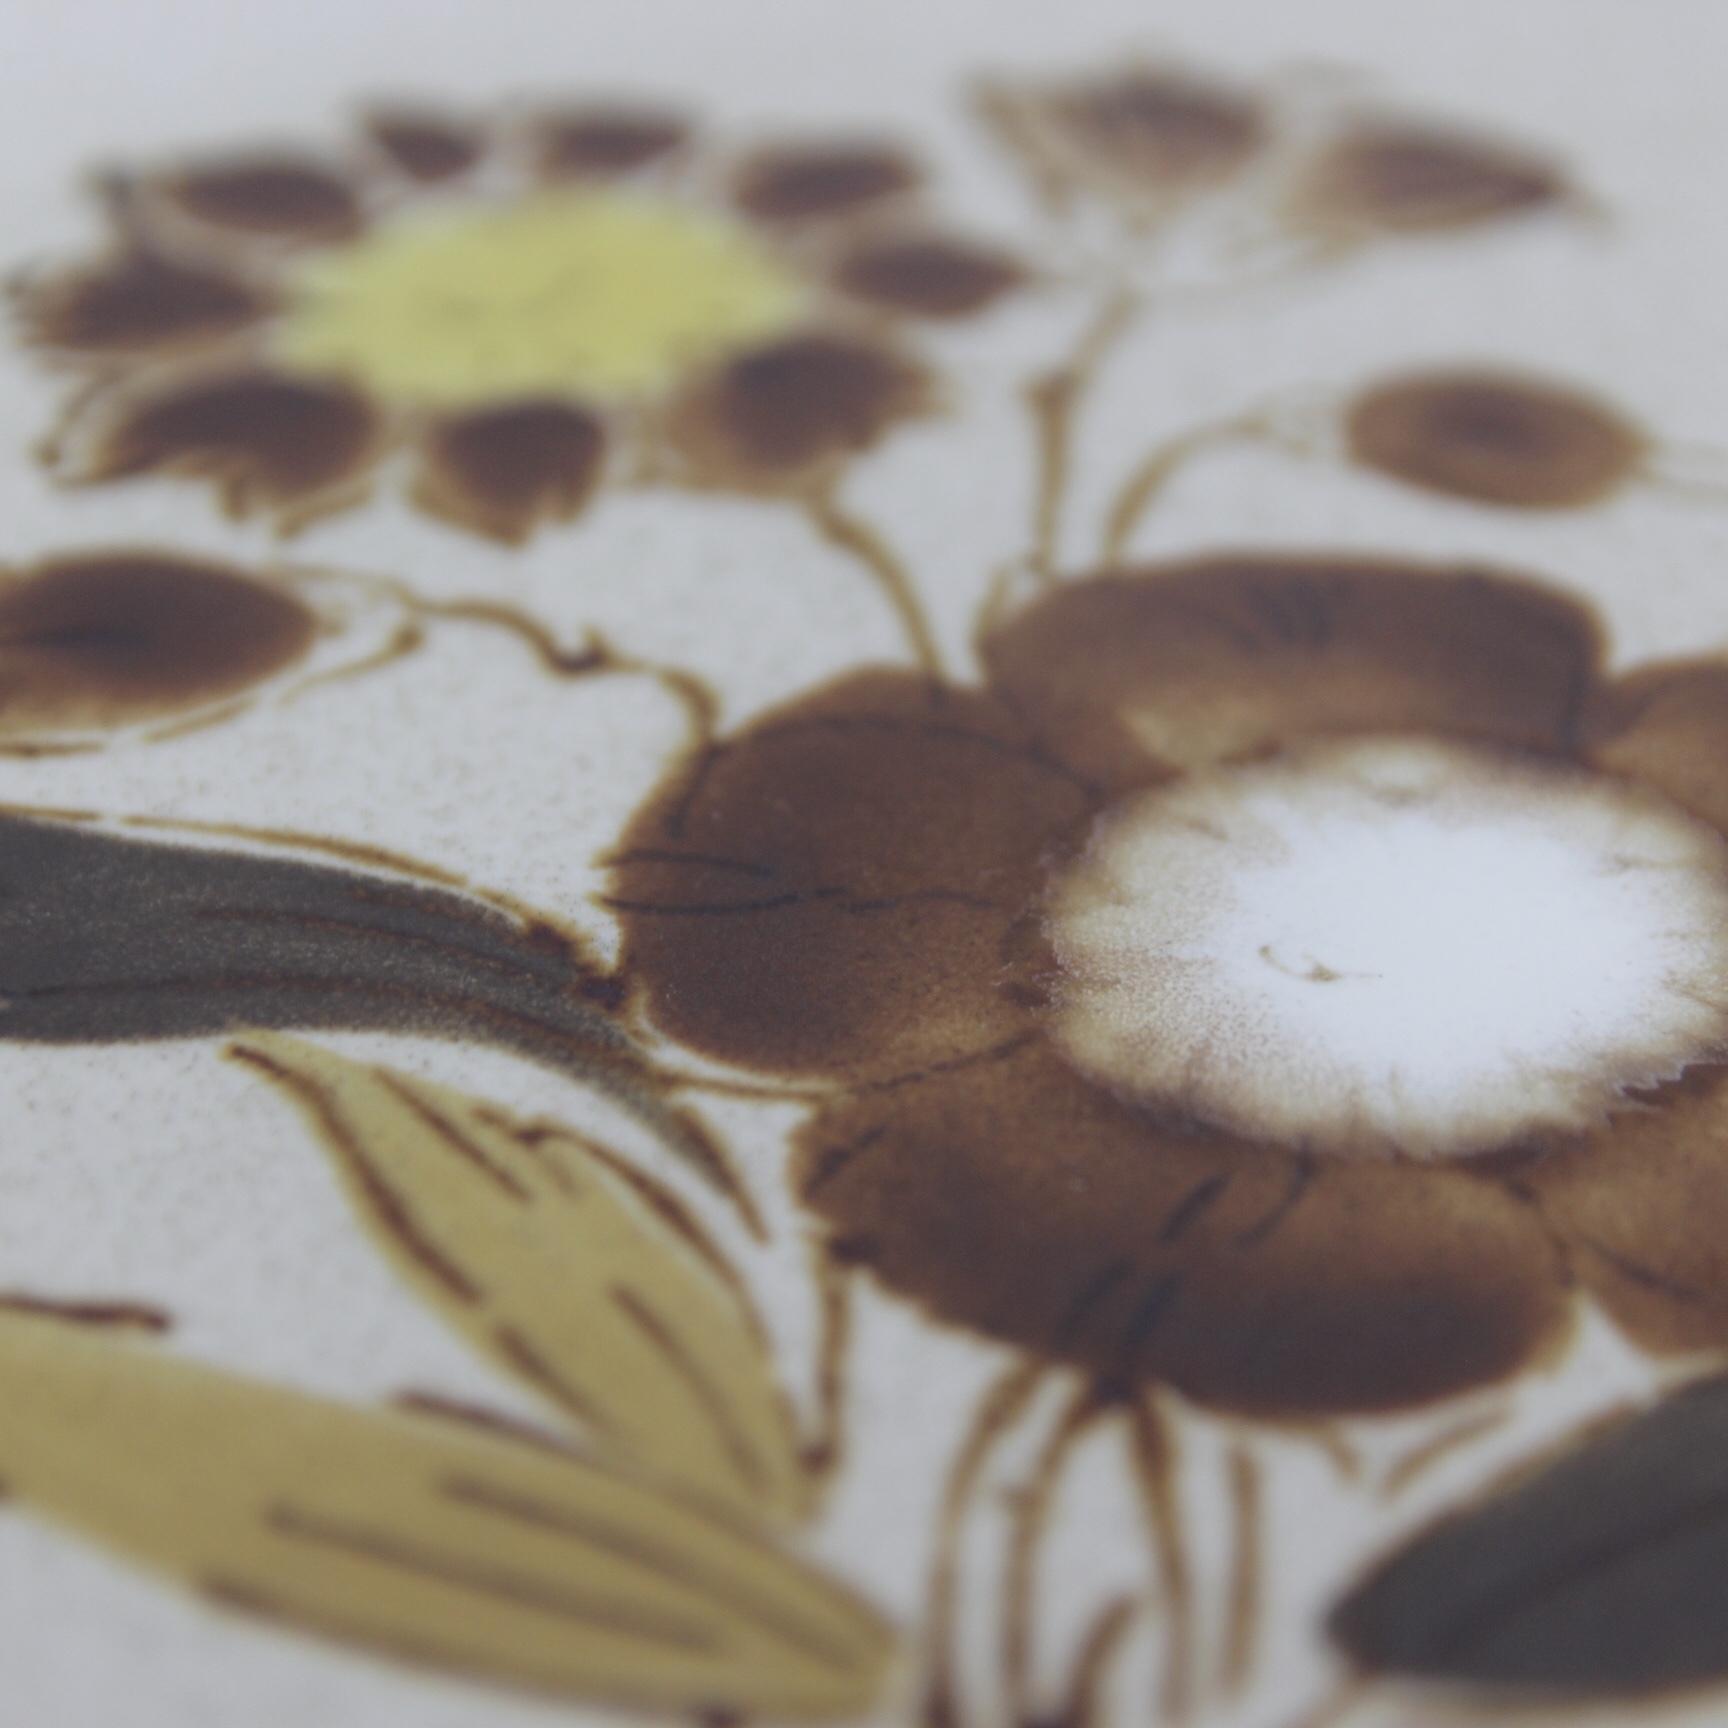 yamaka classic craft 花柄ストーンウェア 在庫5枚